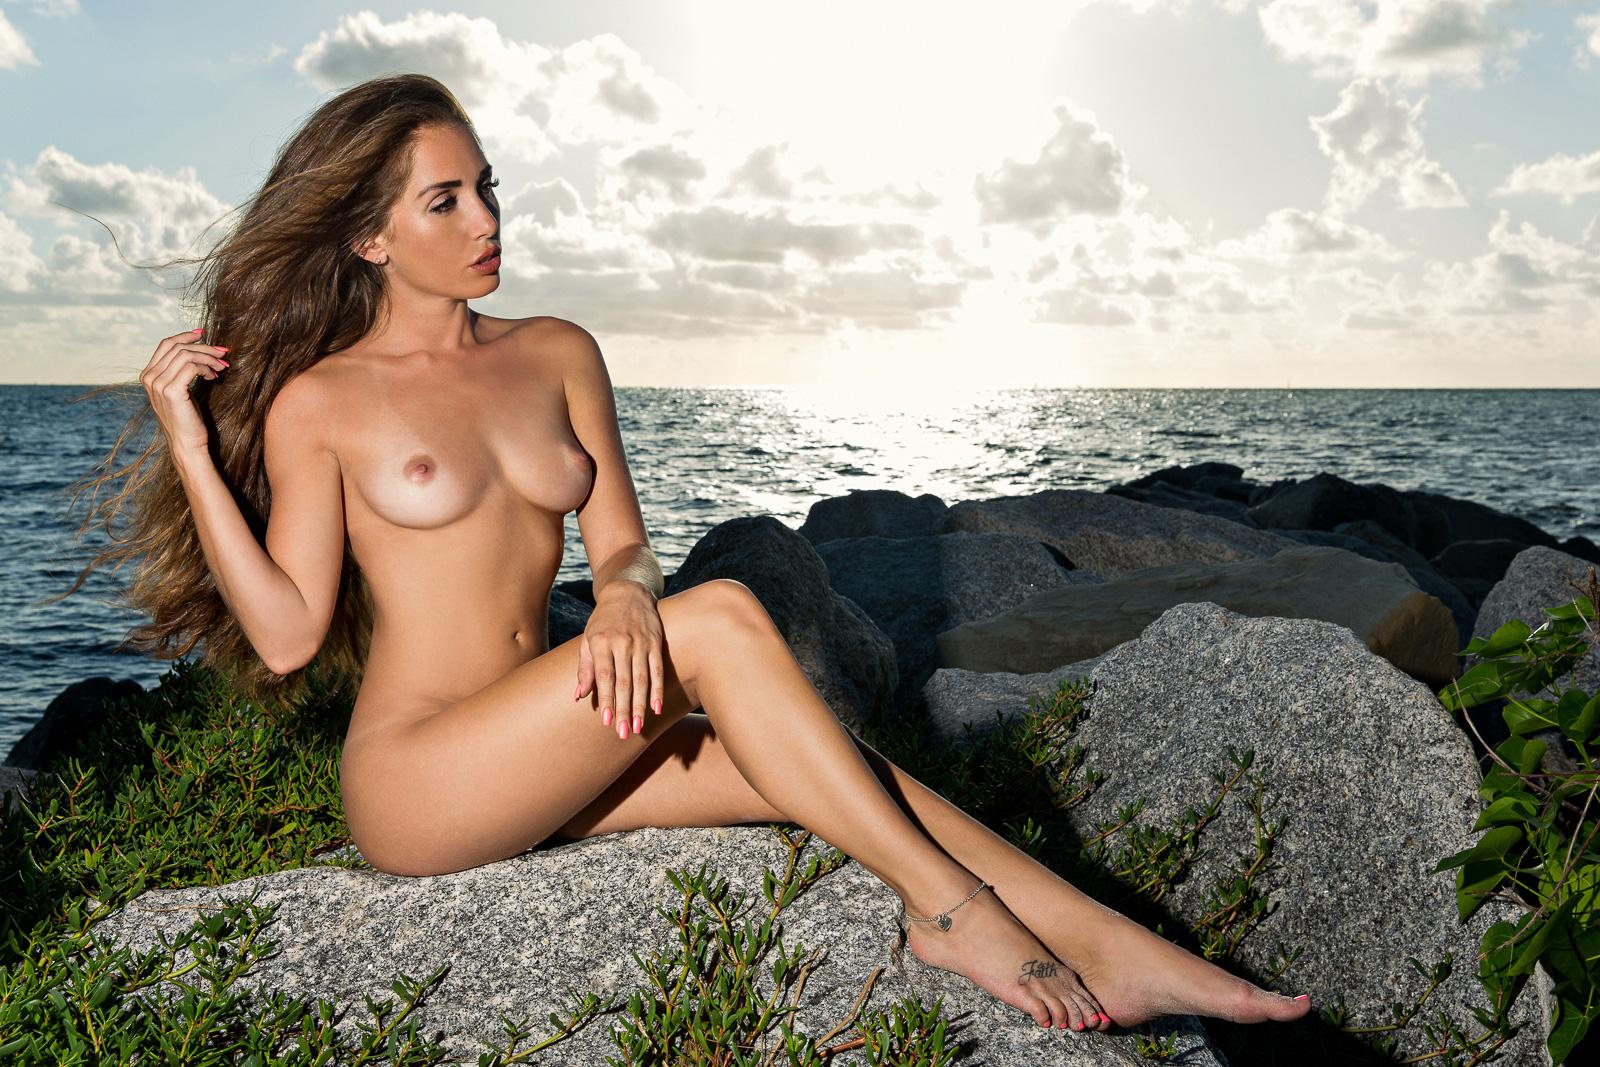 Glamour Model Magazine — The Most Amazing Melissa Lori! The